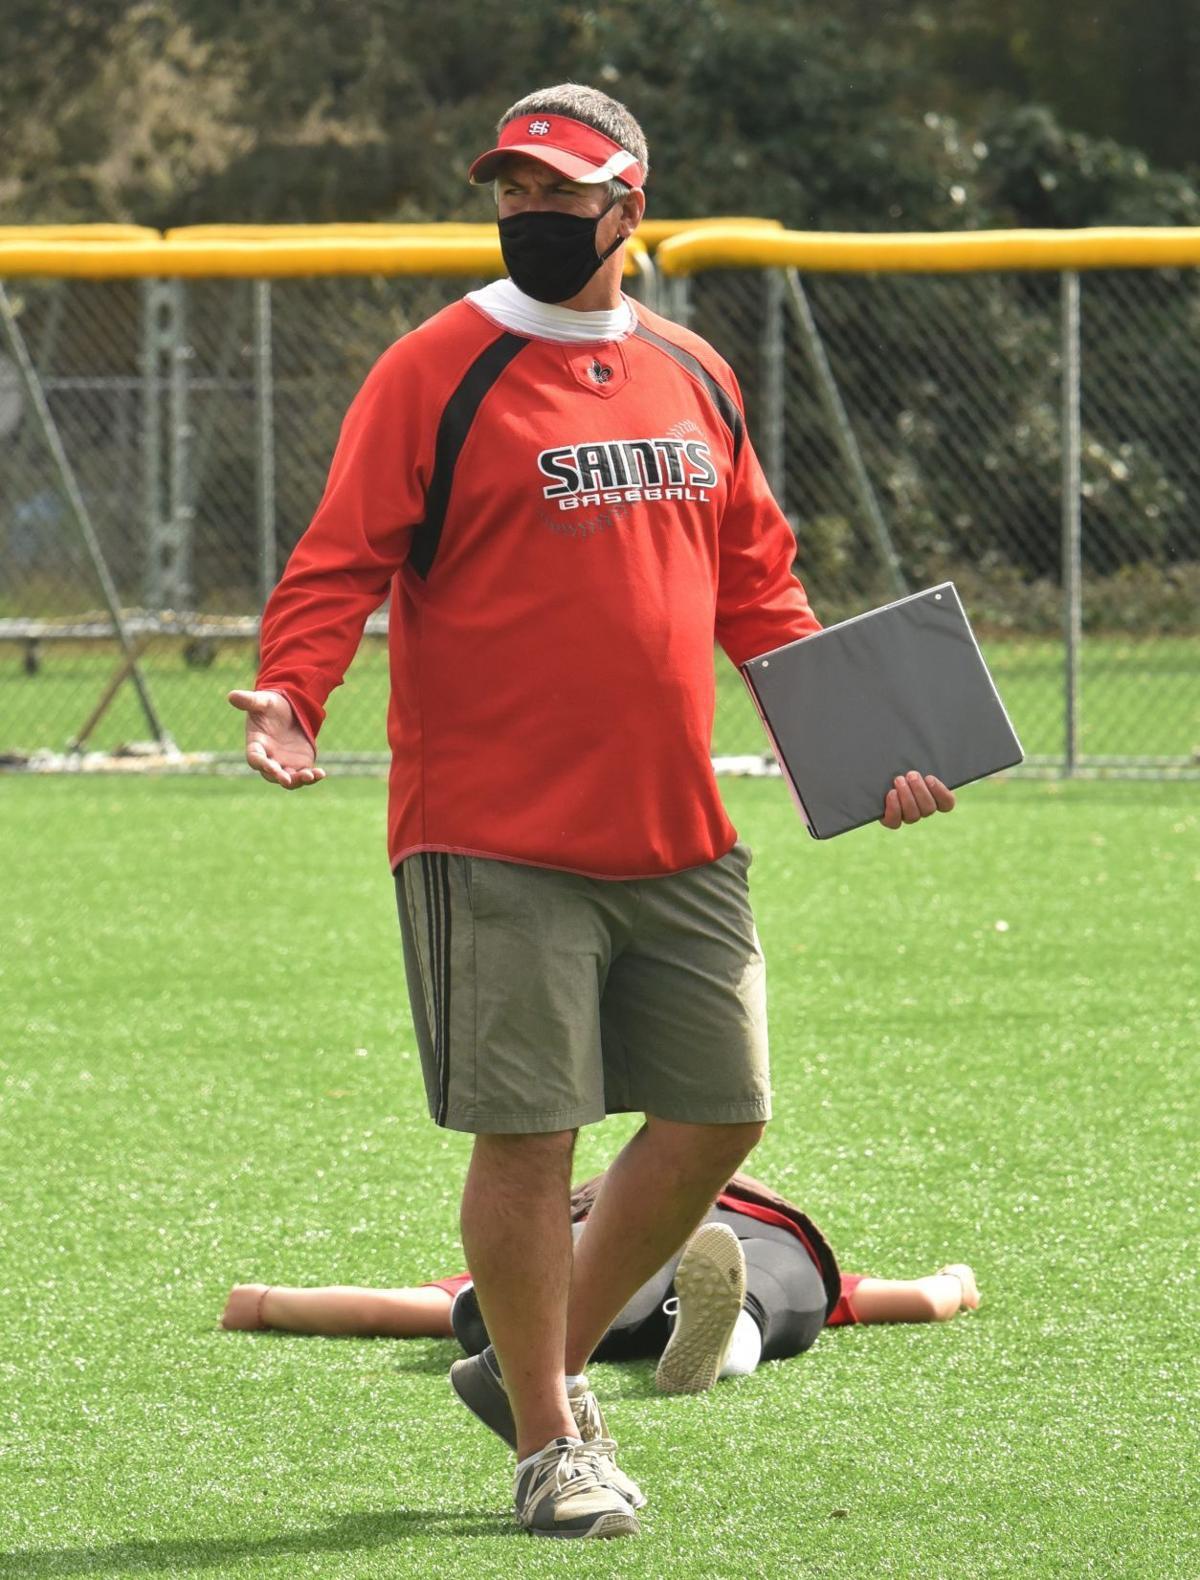 St. Helena High Softball